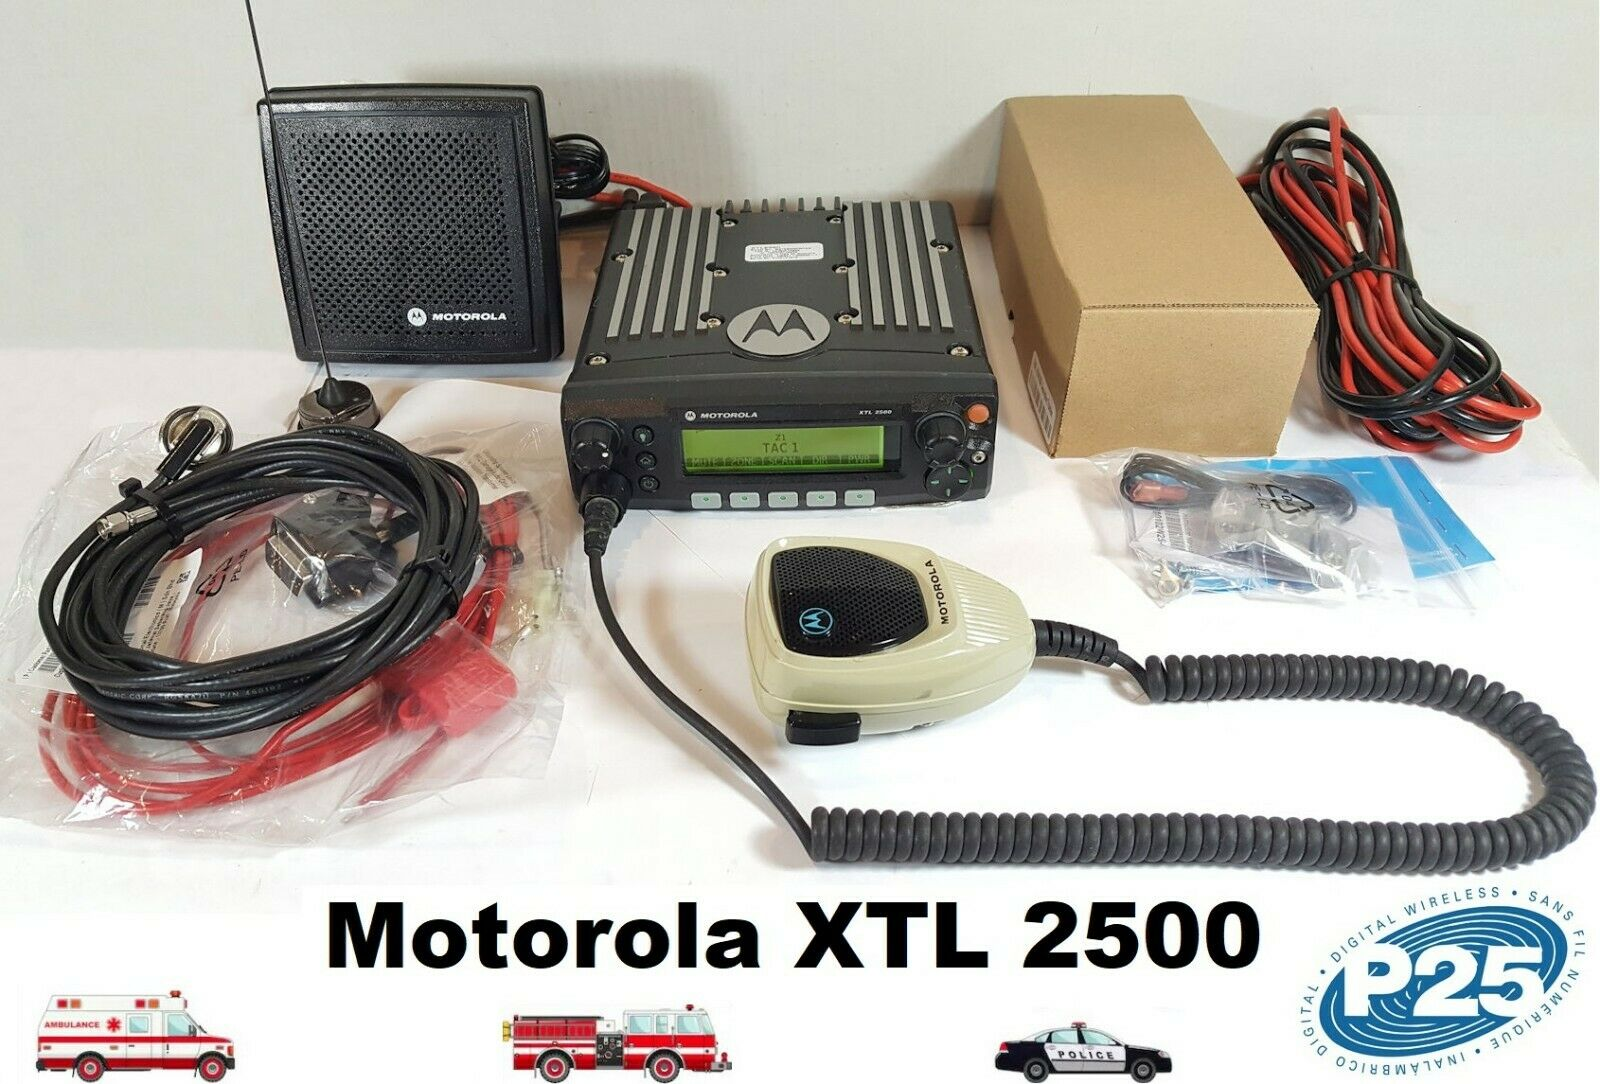 Motorola XTL2500 VHF 136-174 MHz SmartZone P25 Digital Mobile Radio M21KSM9PW1AN. Buy it now for 449.00